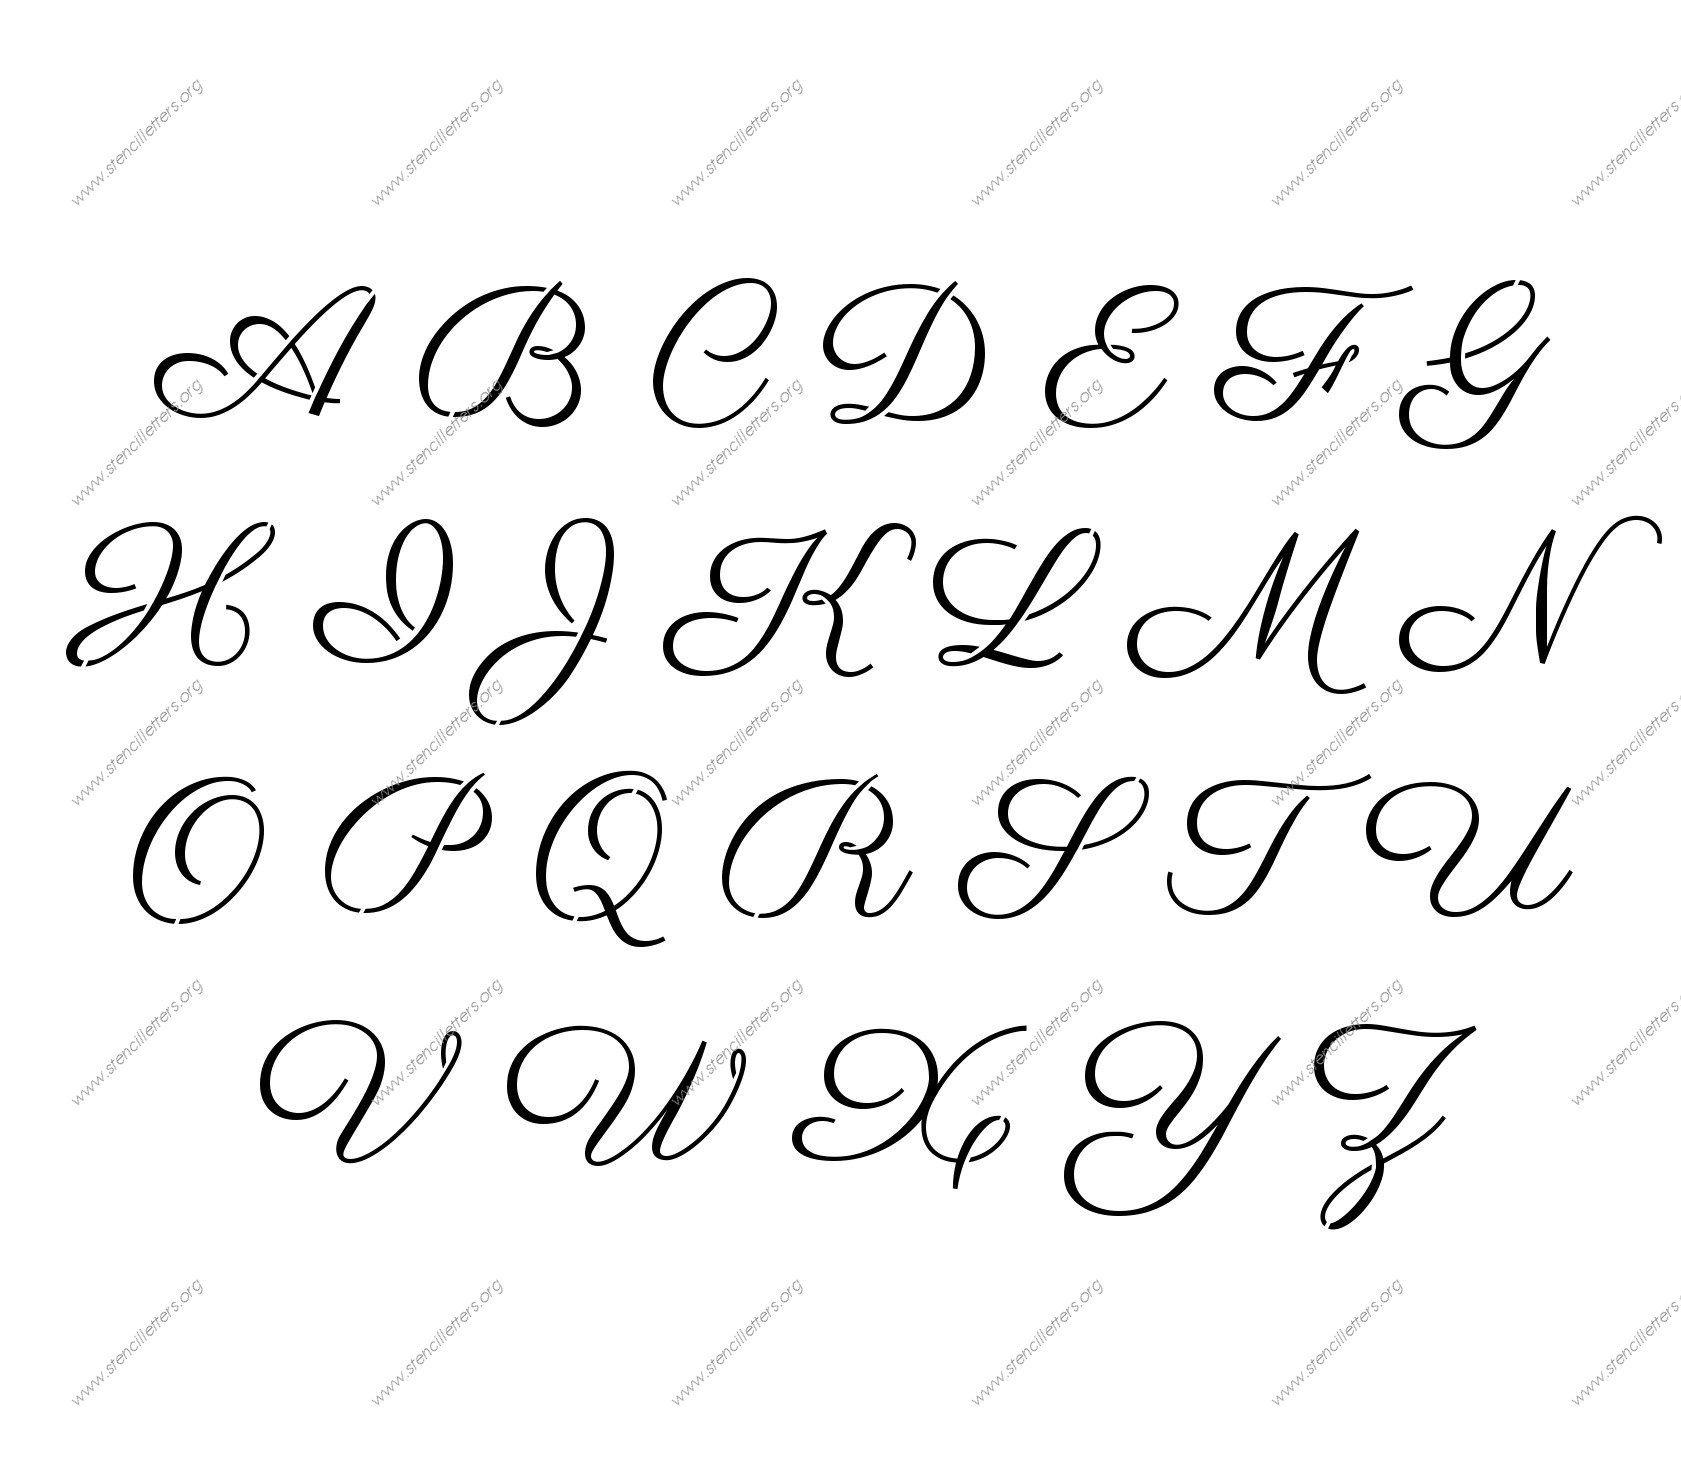 Free Printable Alphabet Stencil Letters Template | Diy | Free - Free Printable Calligraphy Letter Stencils